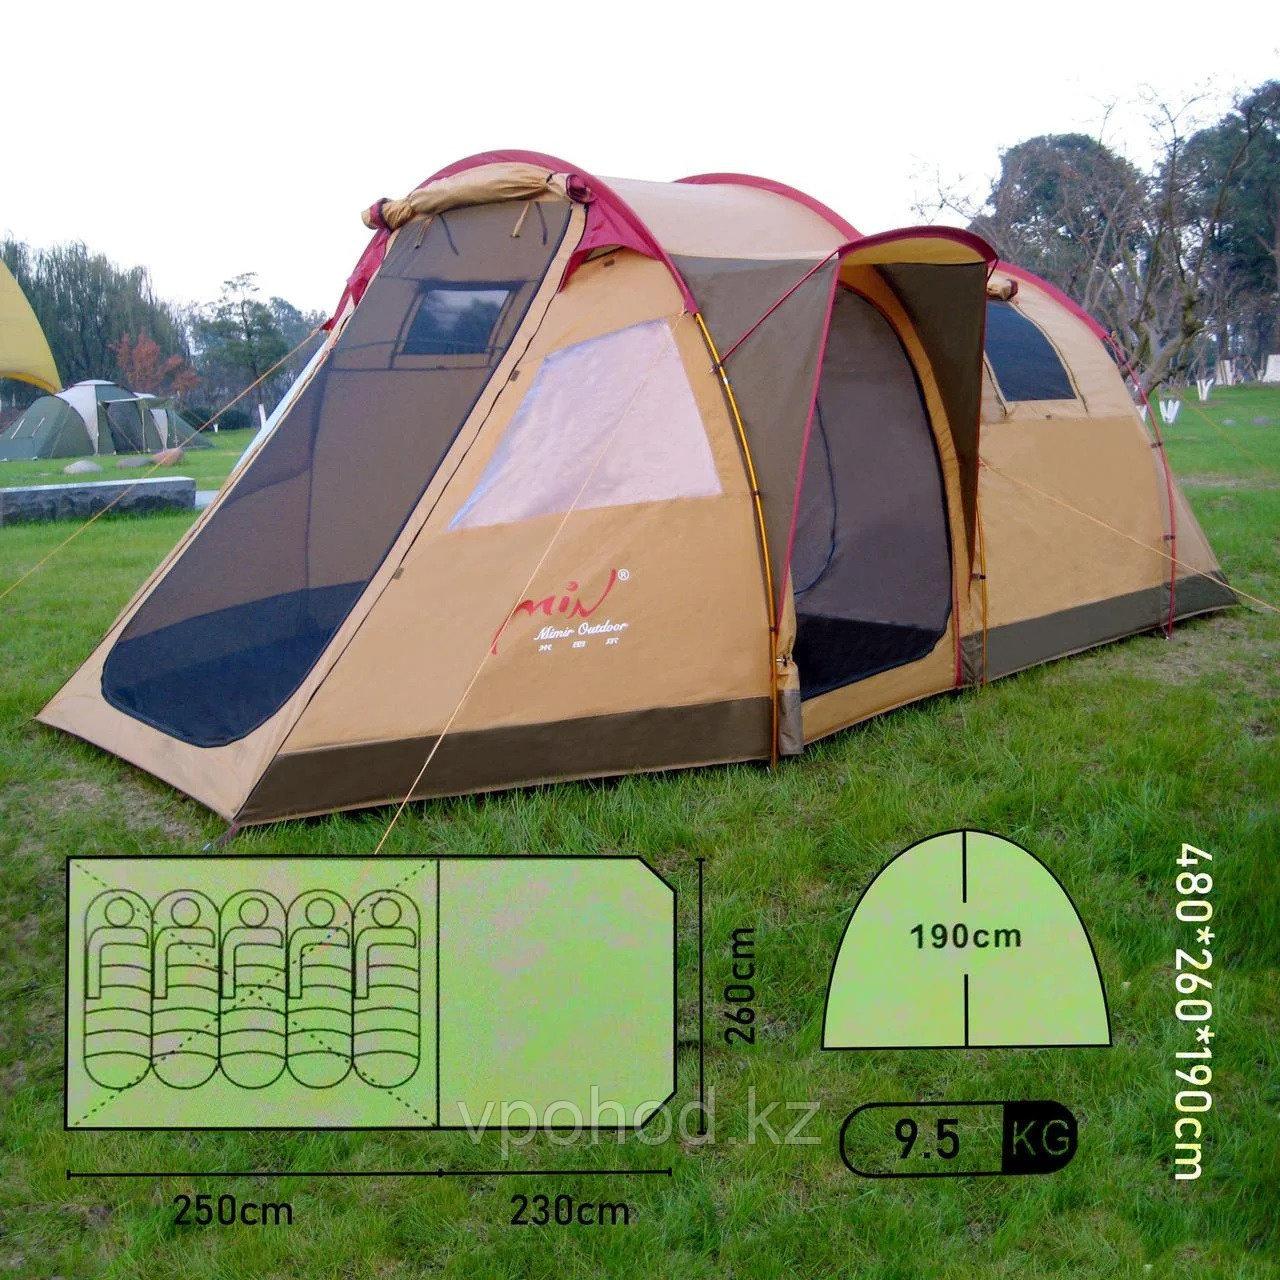 Палатка Mimir X-ART 1850 W 5-9 местная